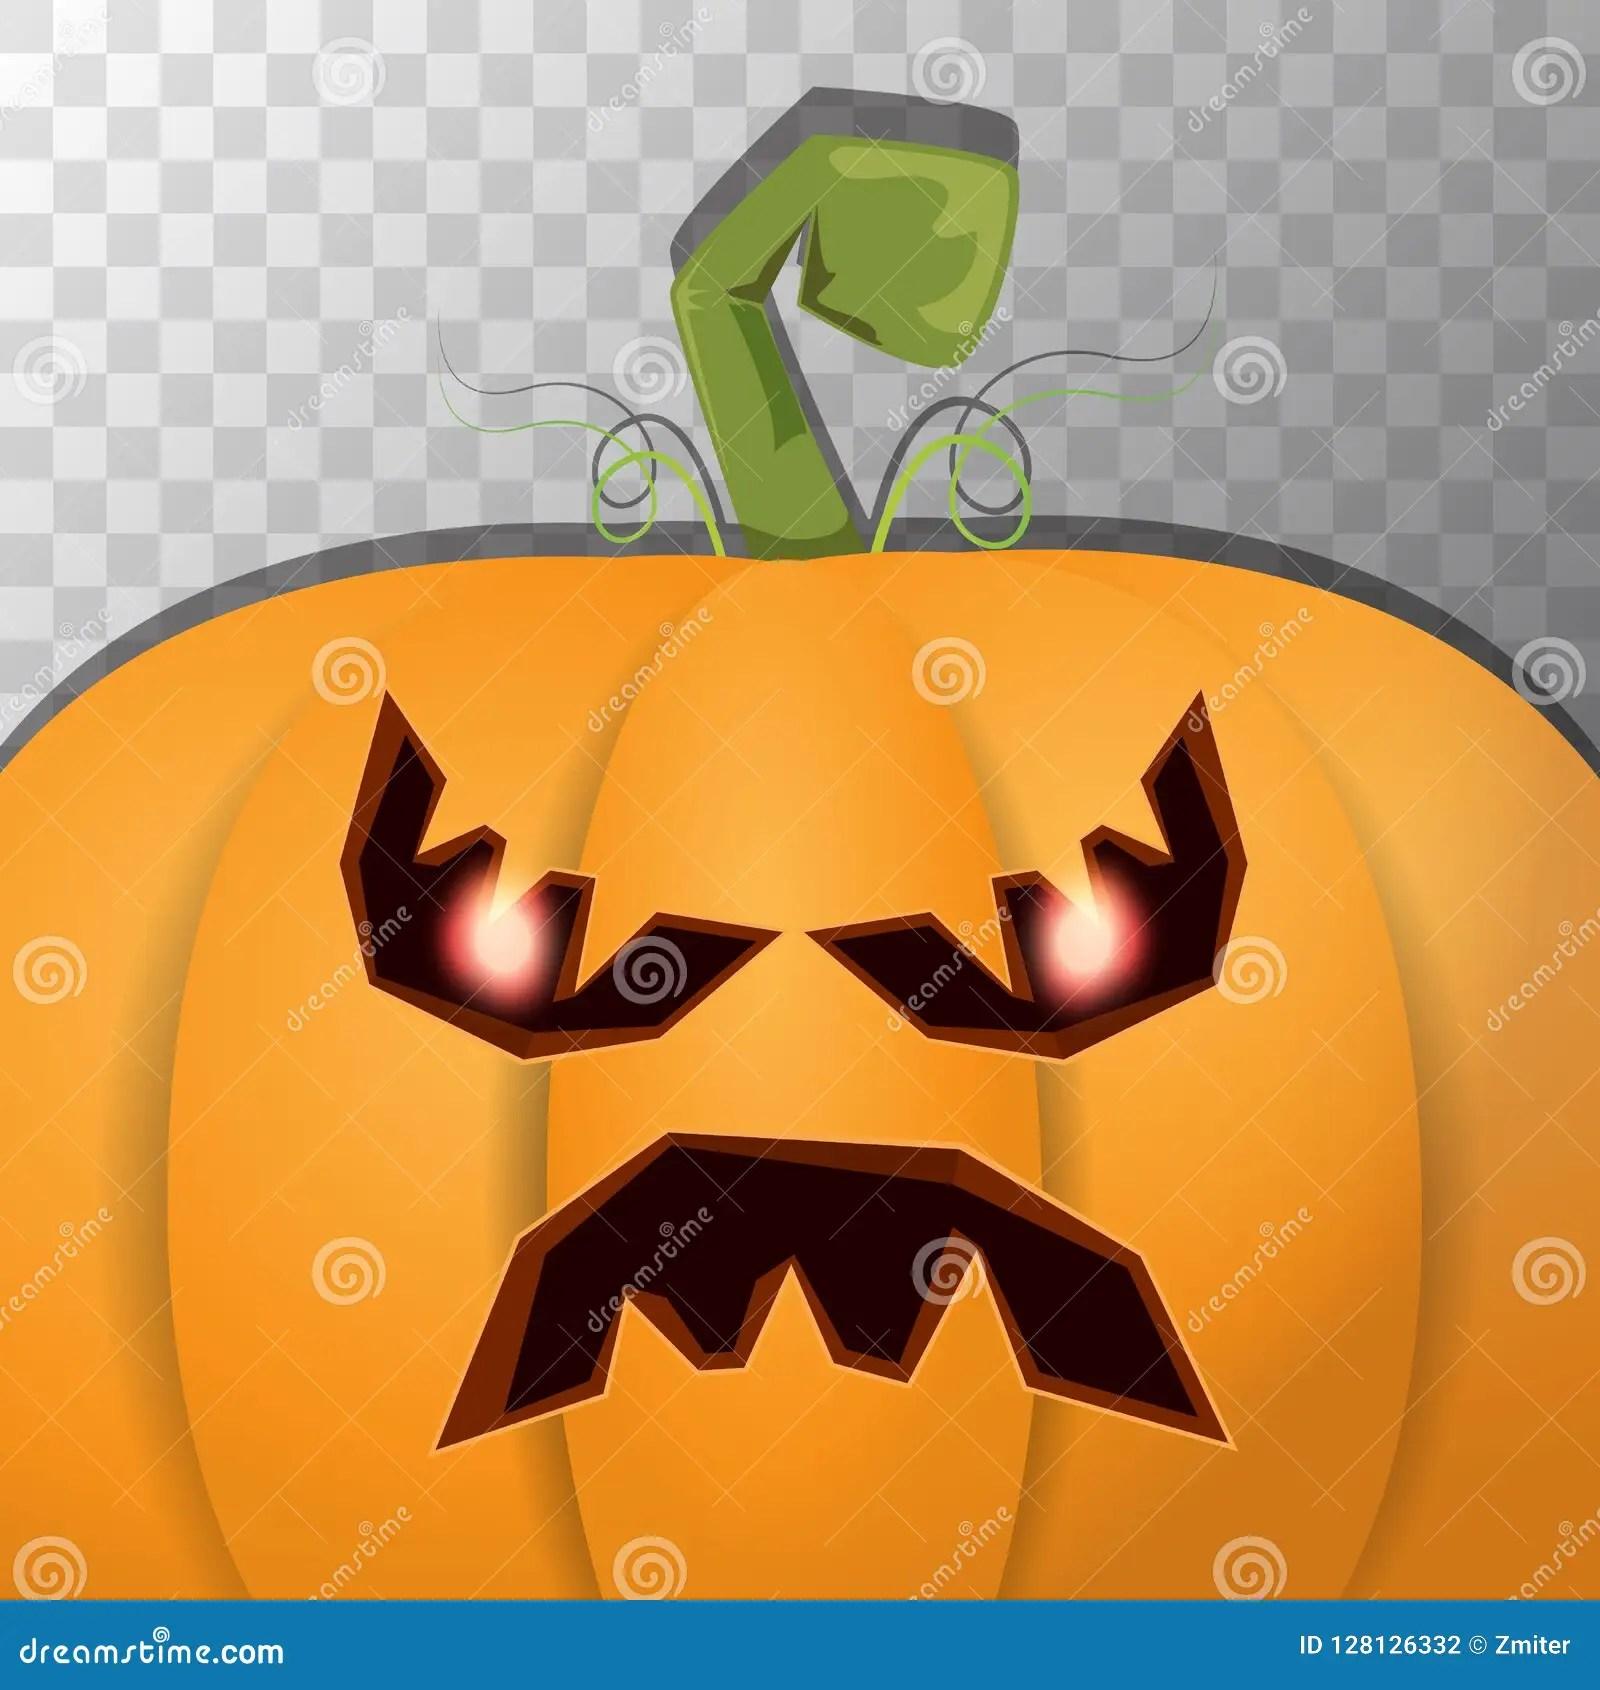 halloween cartoon pumpkin with